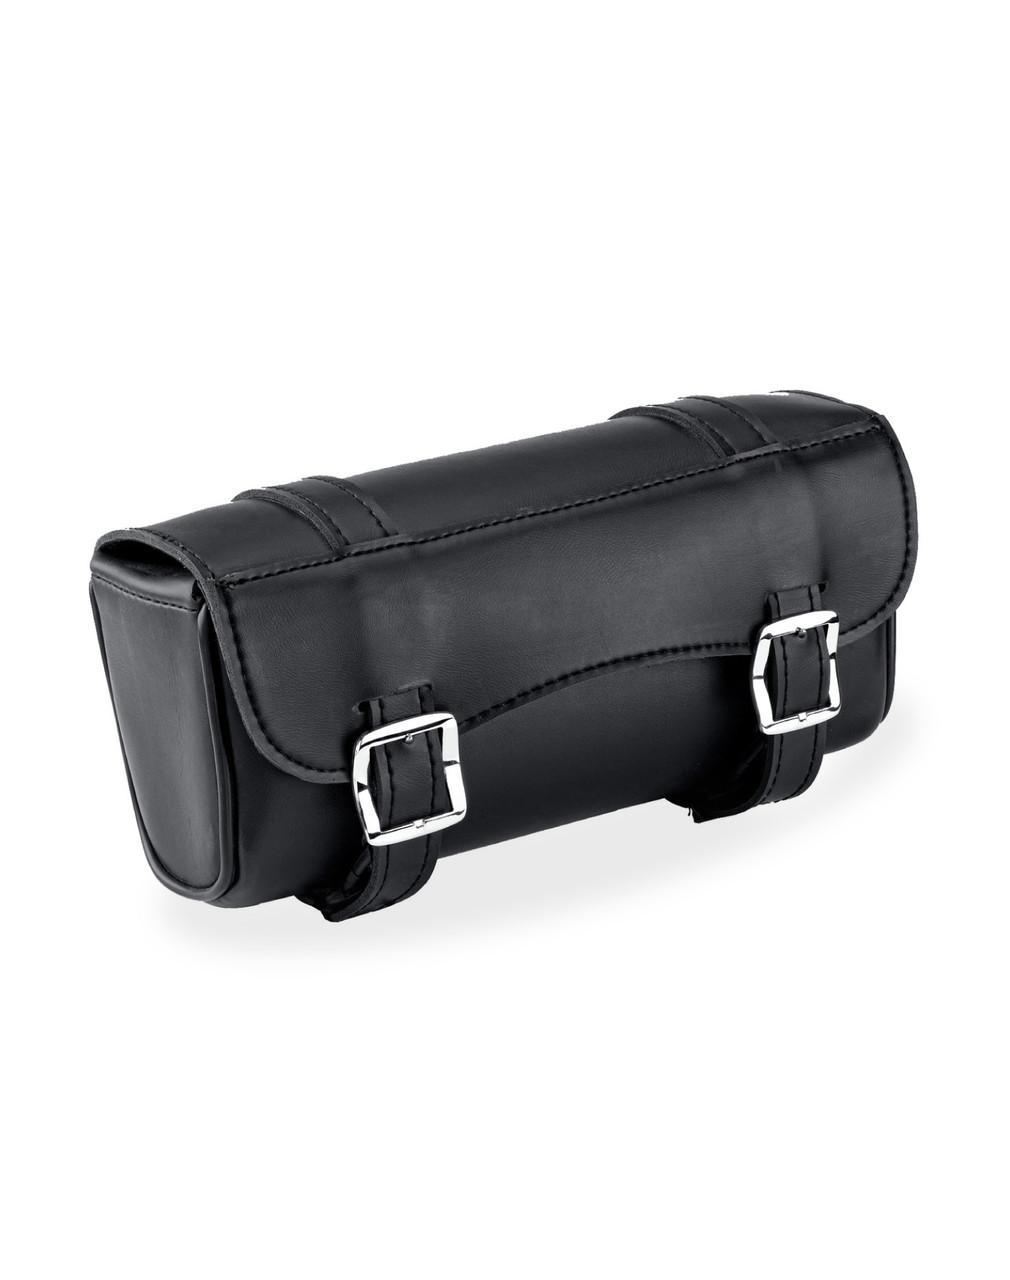 Suzuki Viking Universal Motorcycle Handle Bar Bag Main Bag View